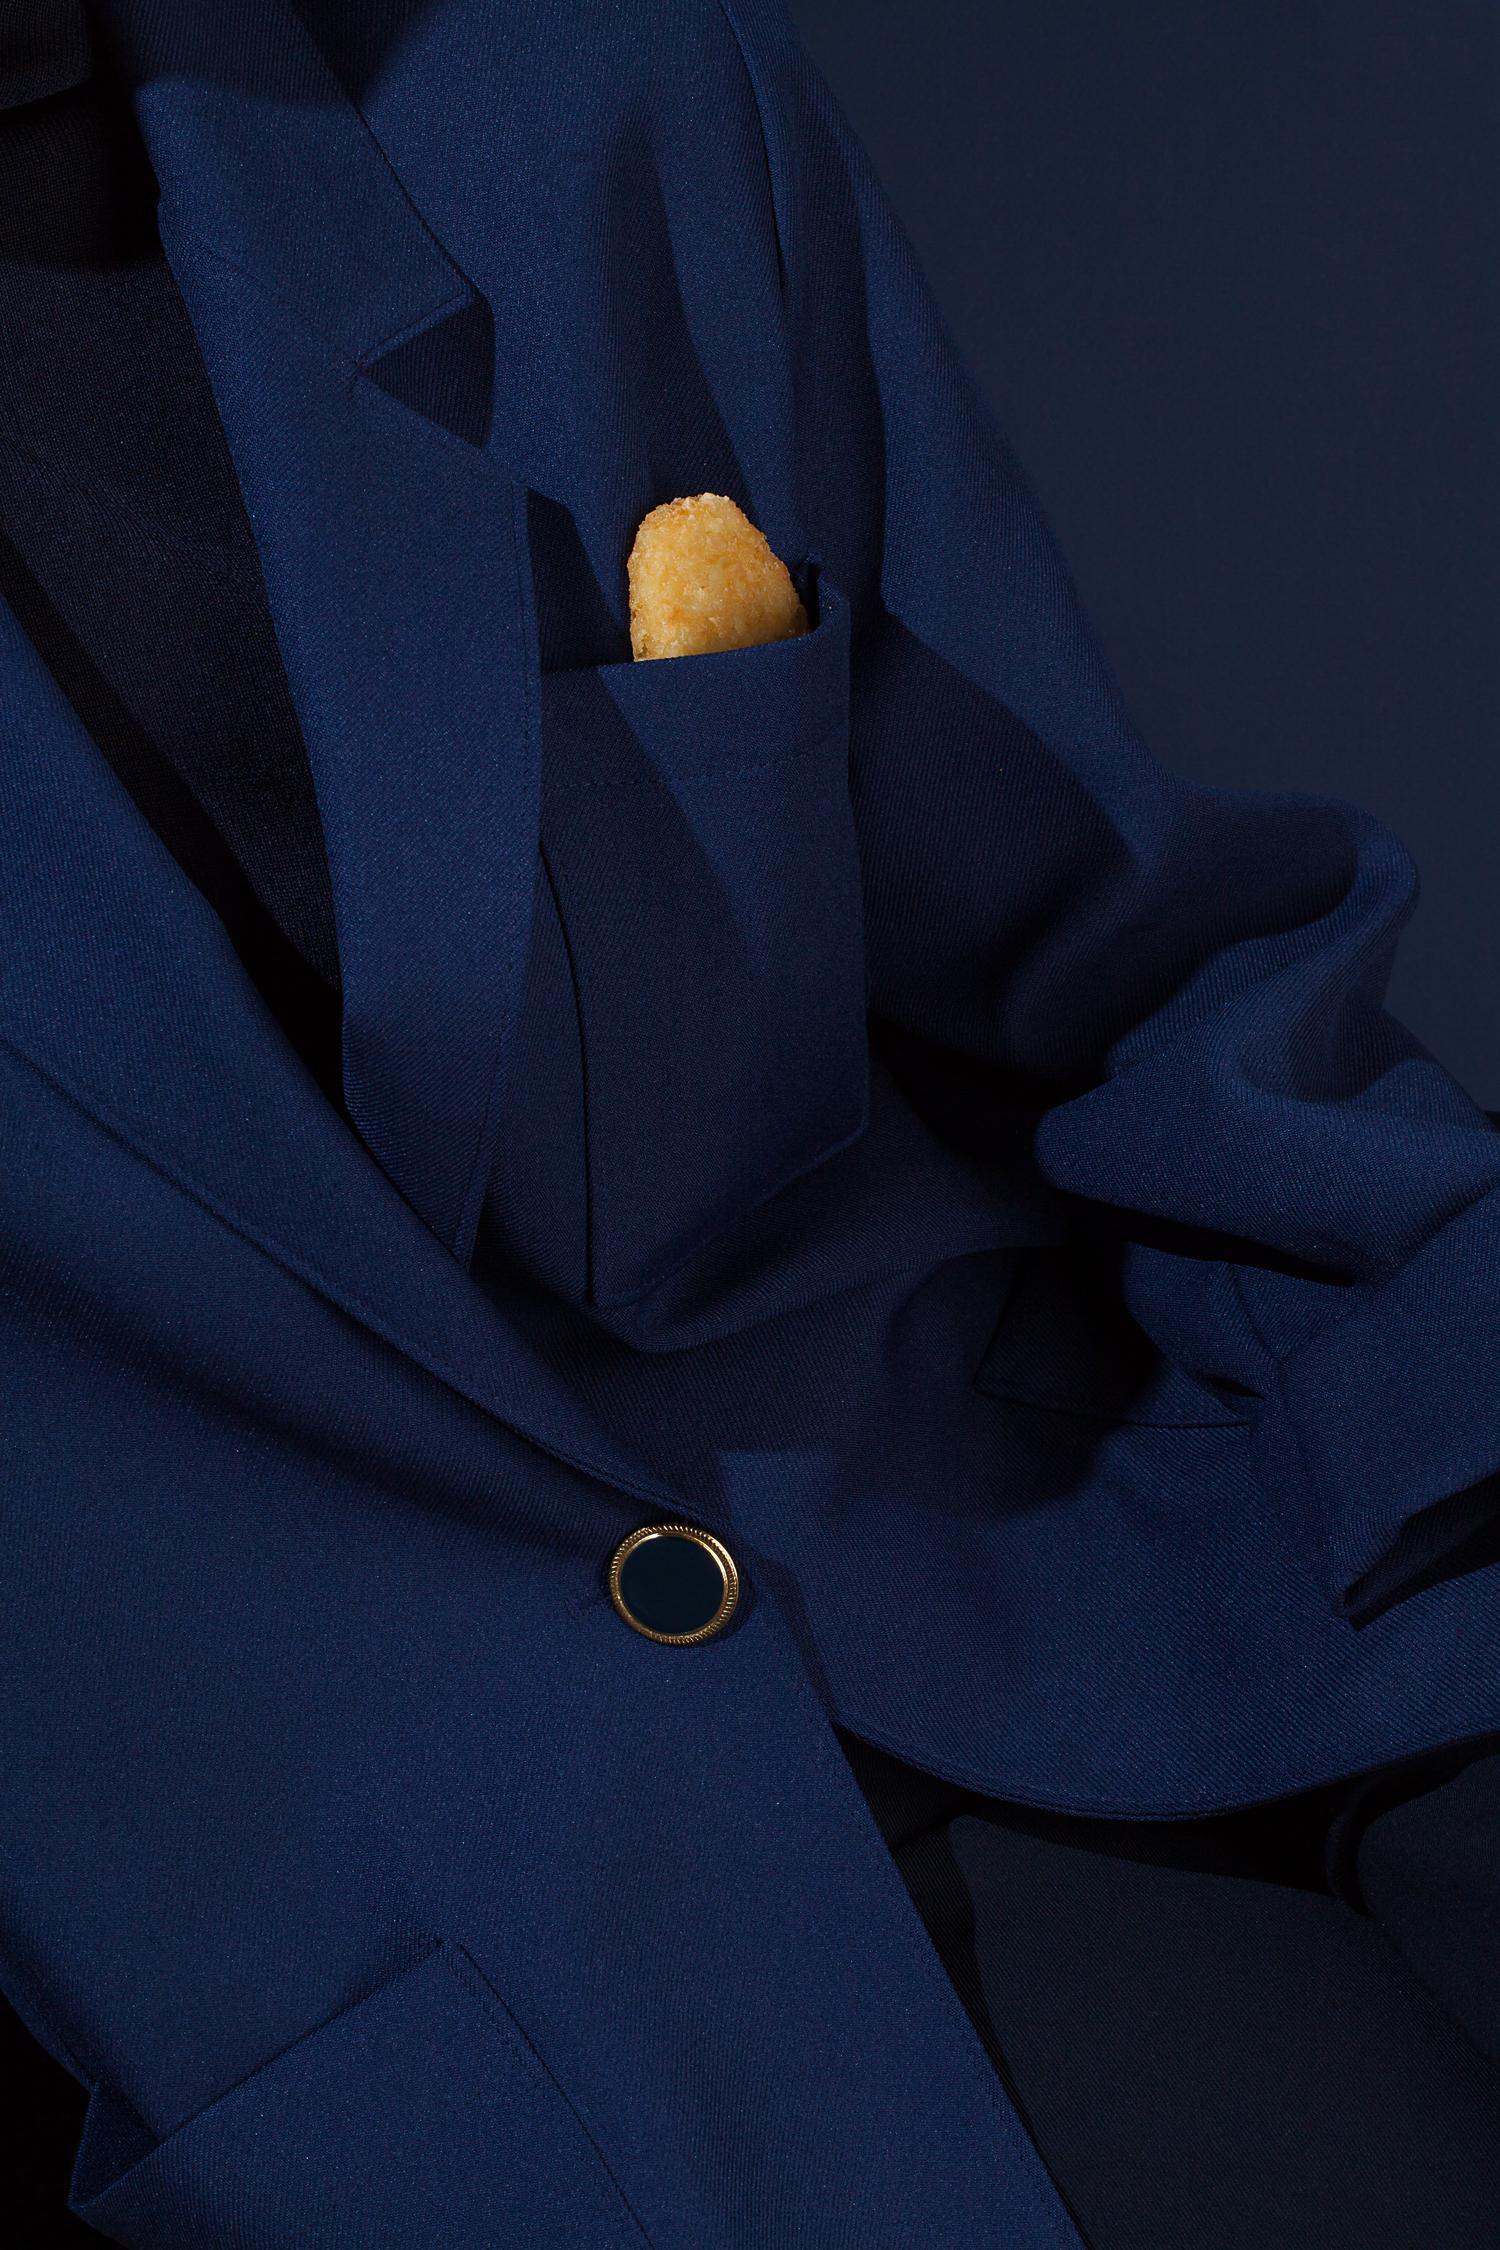 2 Wardrobe-Snacks-352.jpg